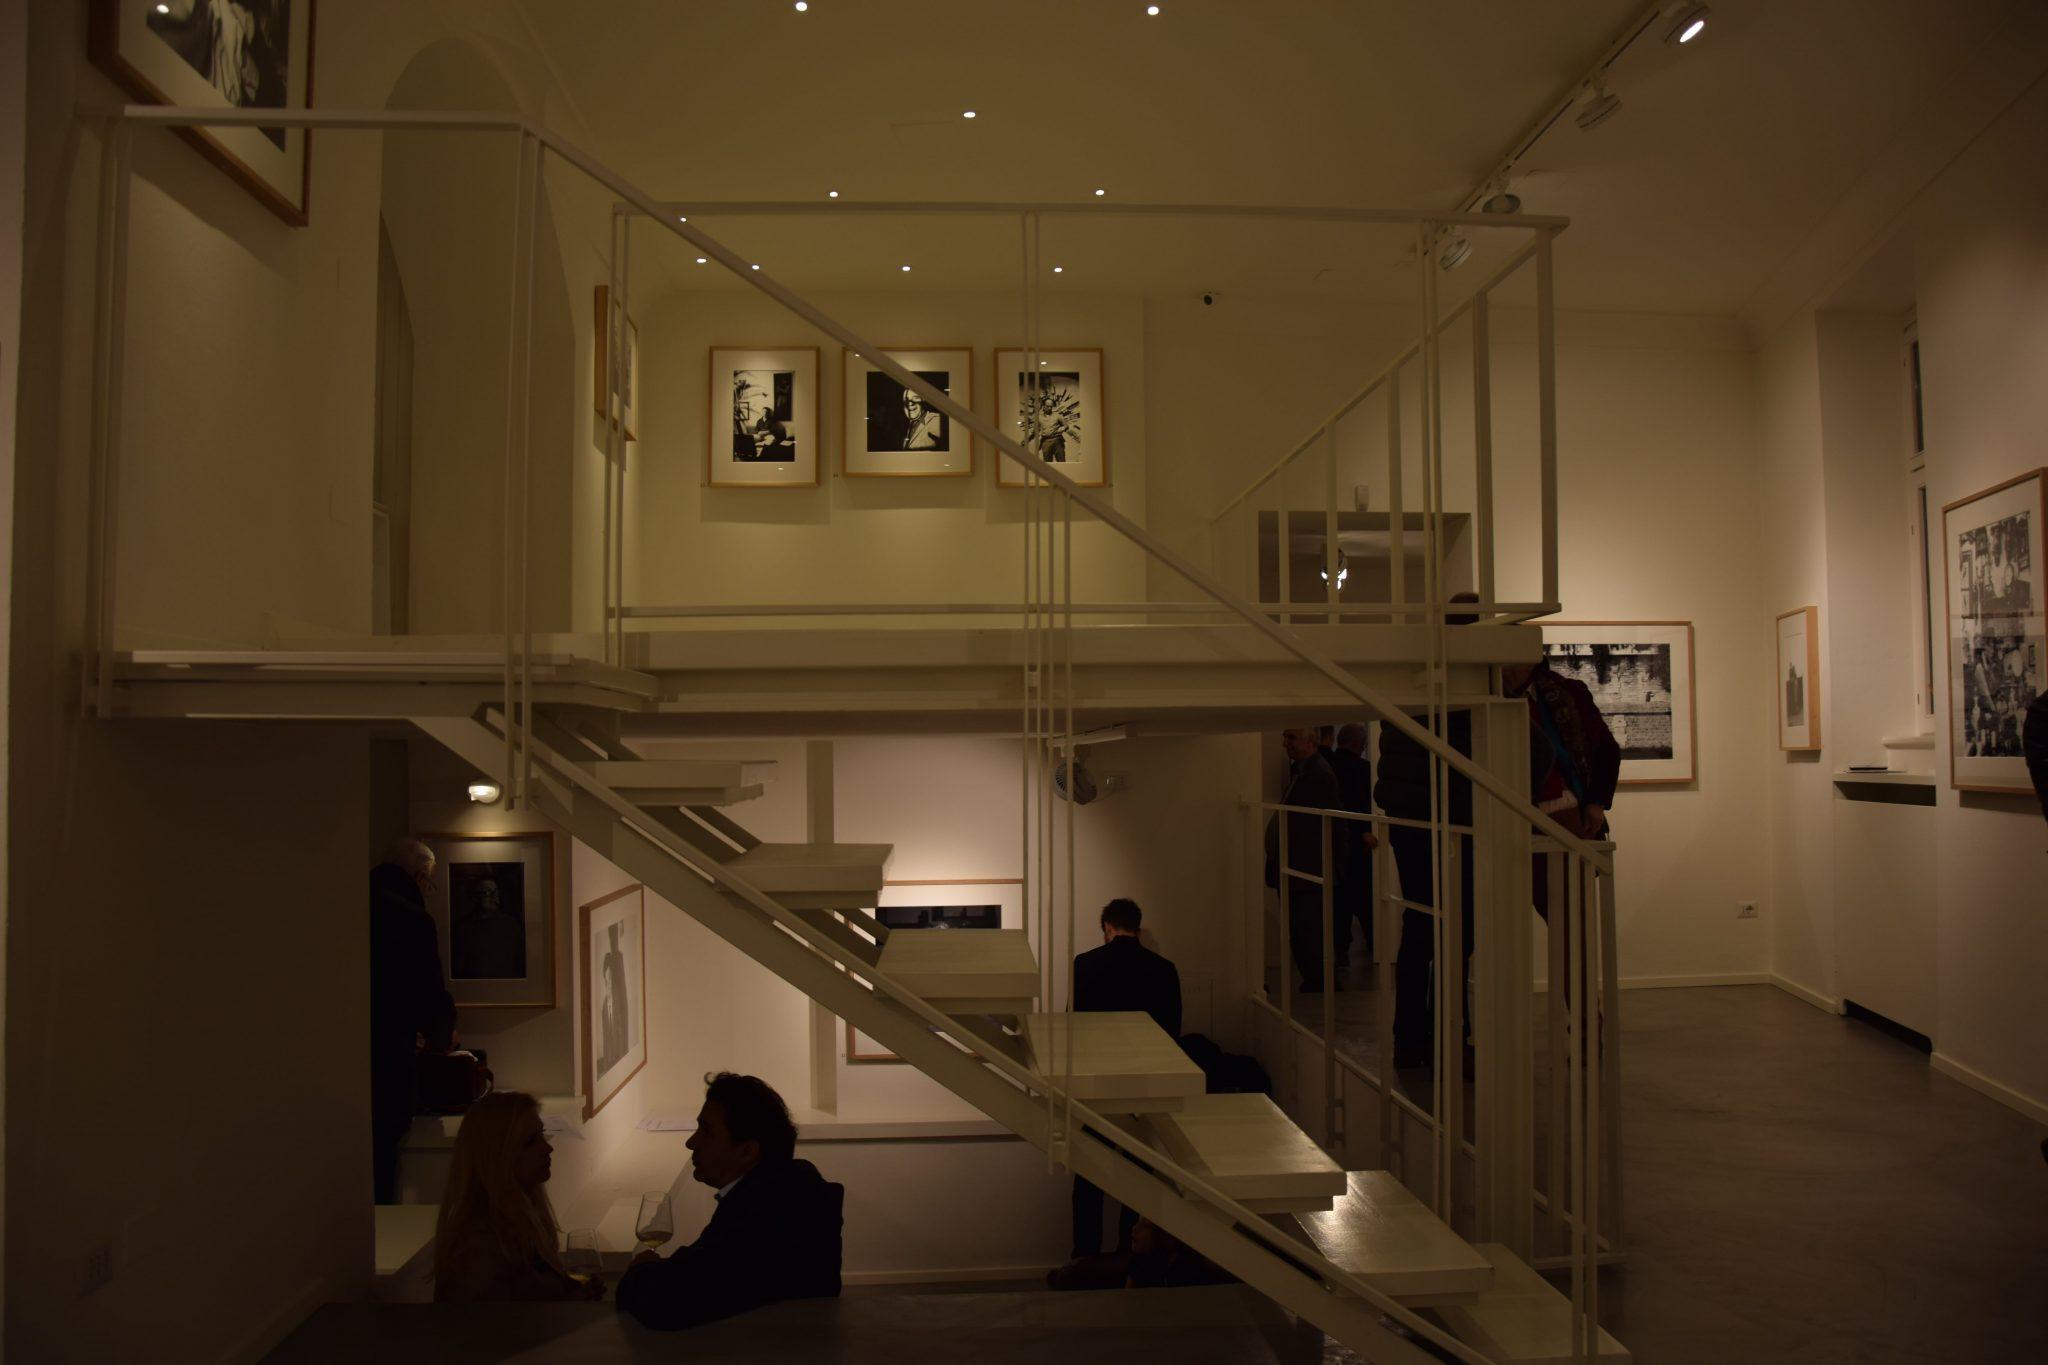 Kurt Amman galleria 29 arts in progress